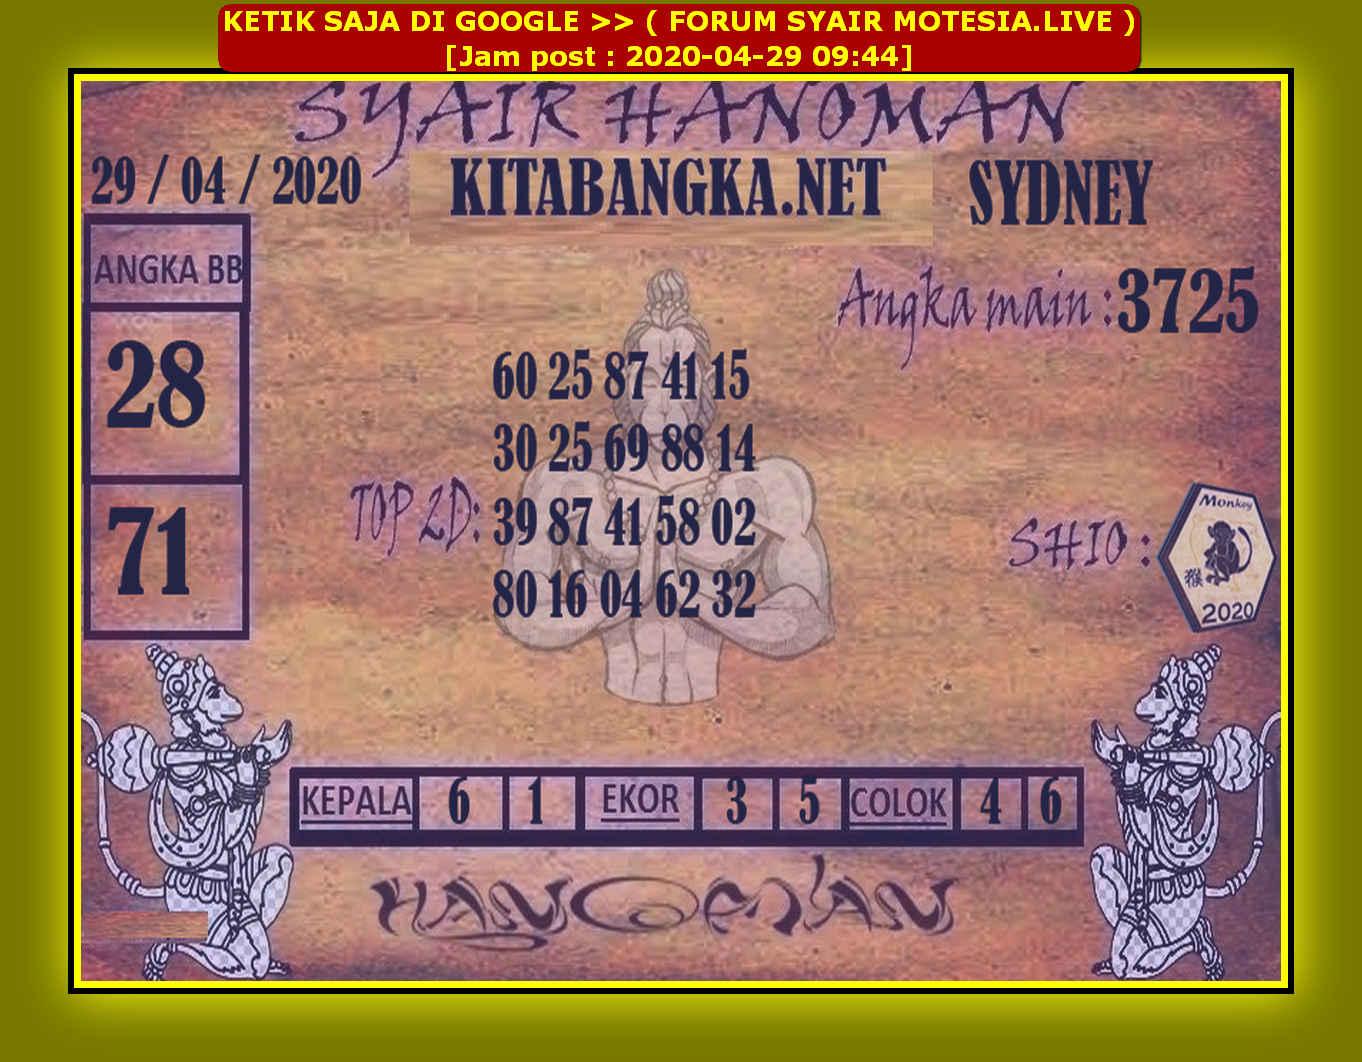 Kode syair Sydney Rabu 29 April 2020 53